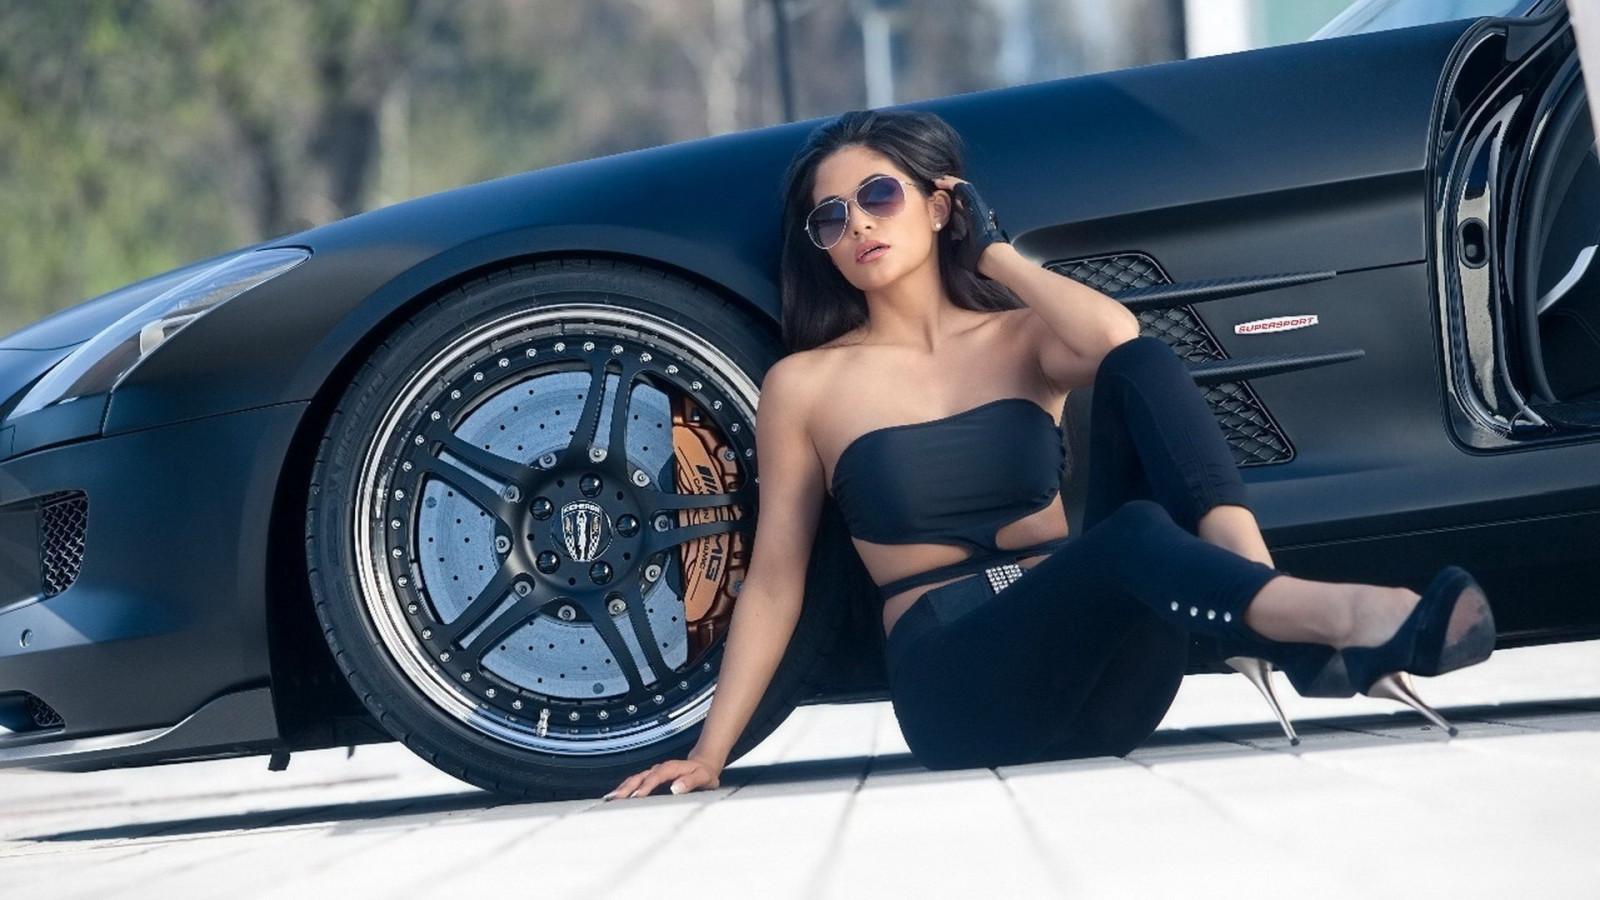 fond d 39 cran femmes maquette bmw v hicule femmes avec des voitures voiture de sport au. Black Bedroom Furniture Sets. Home Design Ideas